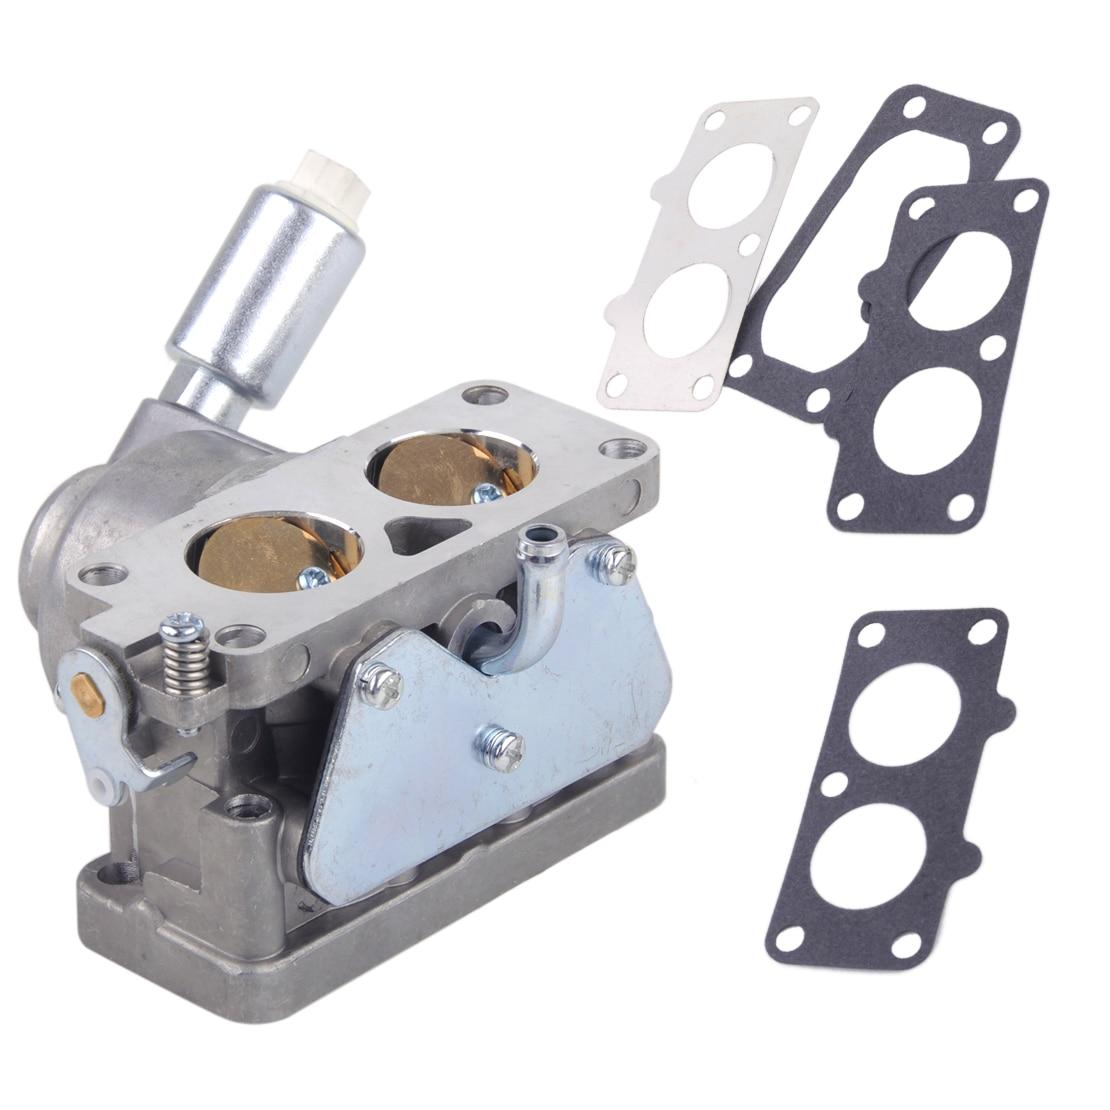 где купить LETAOSK New Carburetor Carb with Gasket fit for Briggs & Stratton 792295 Replacement Accessories по лучшей цене